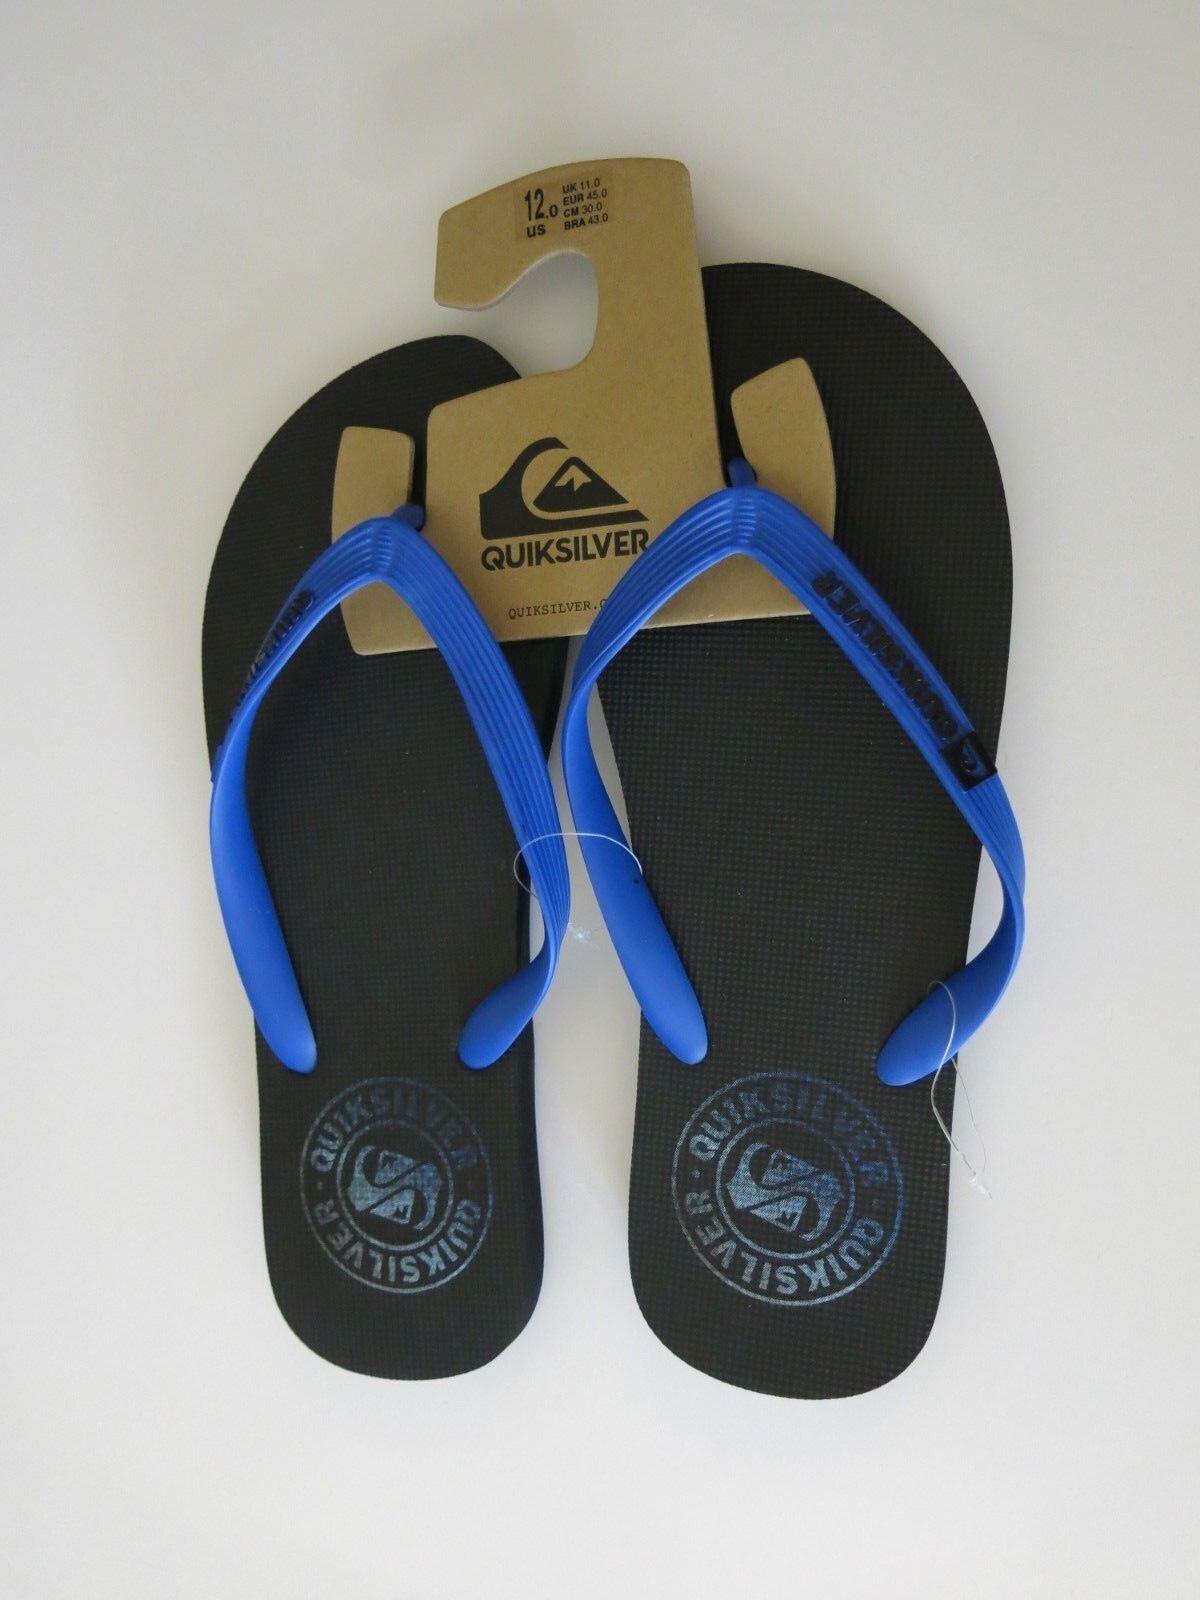 591af486a3e019 Quiksilver 12 Men s Flip Flops Sandals Shoes Black Black Black and Blue  Surf Beach Summer dfbb55